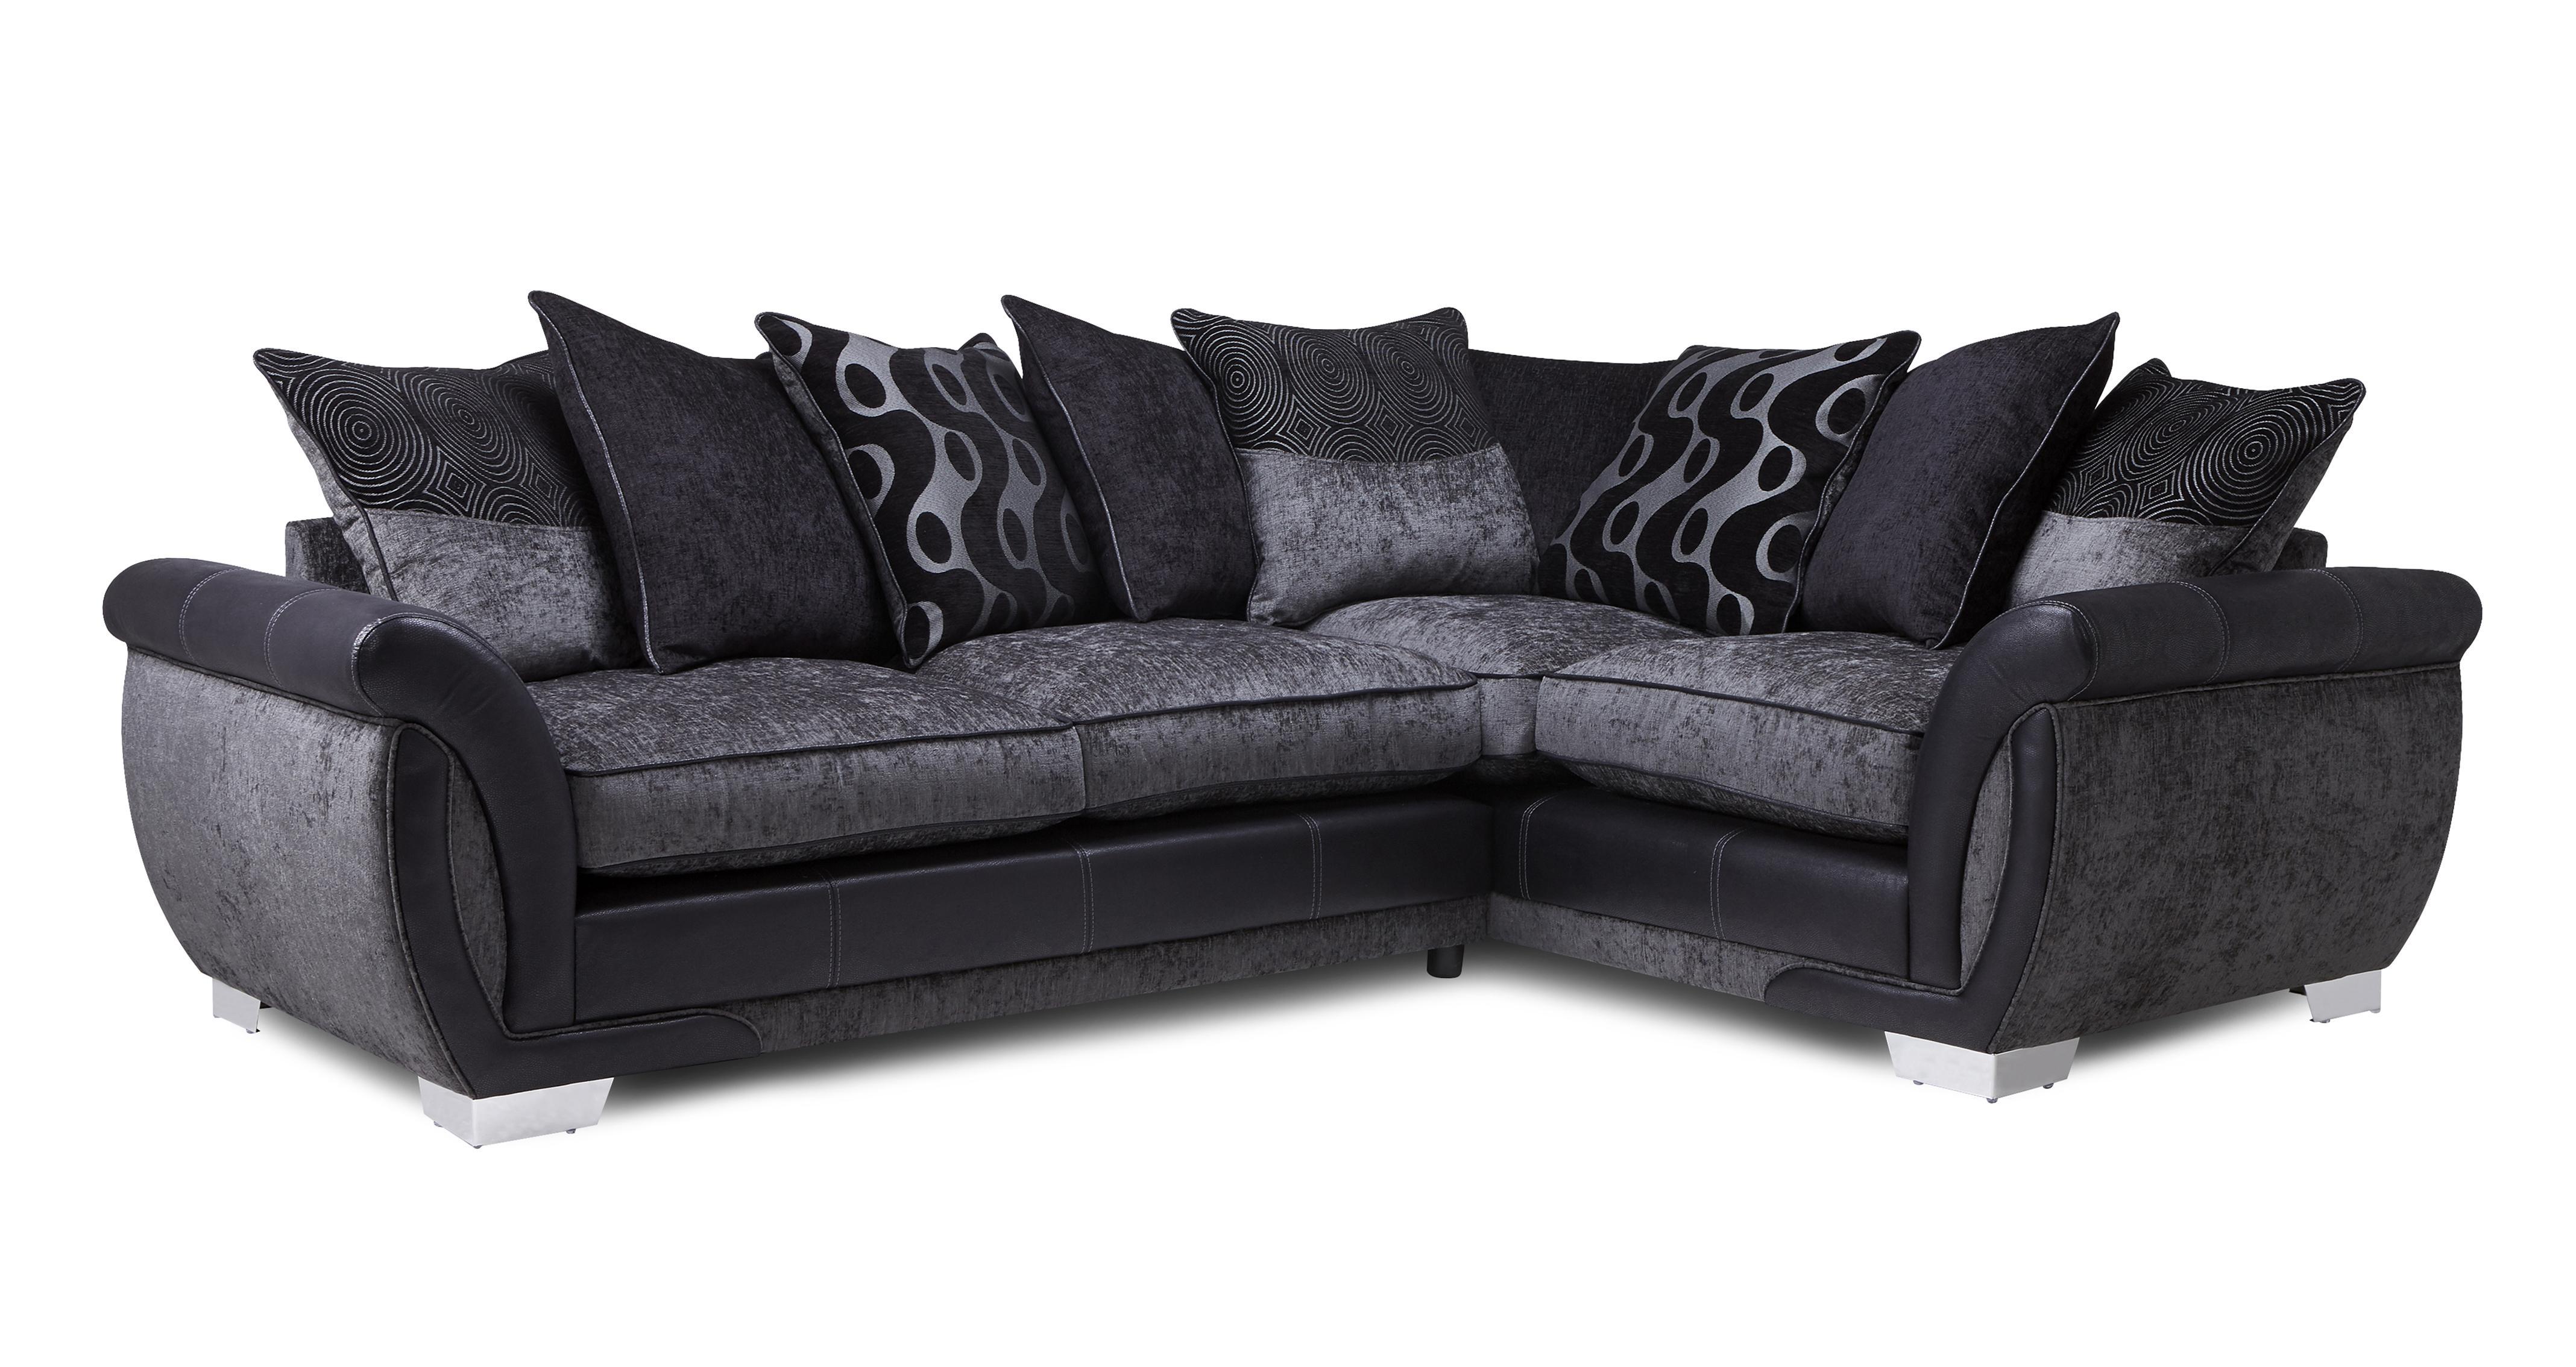 sofa connection memphis harmony queen size memory foam bed dfs shannon corner brokeasshome